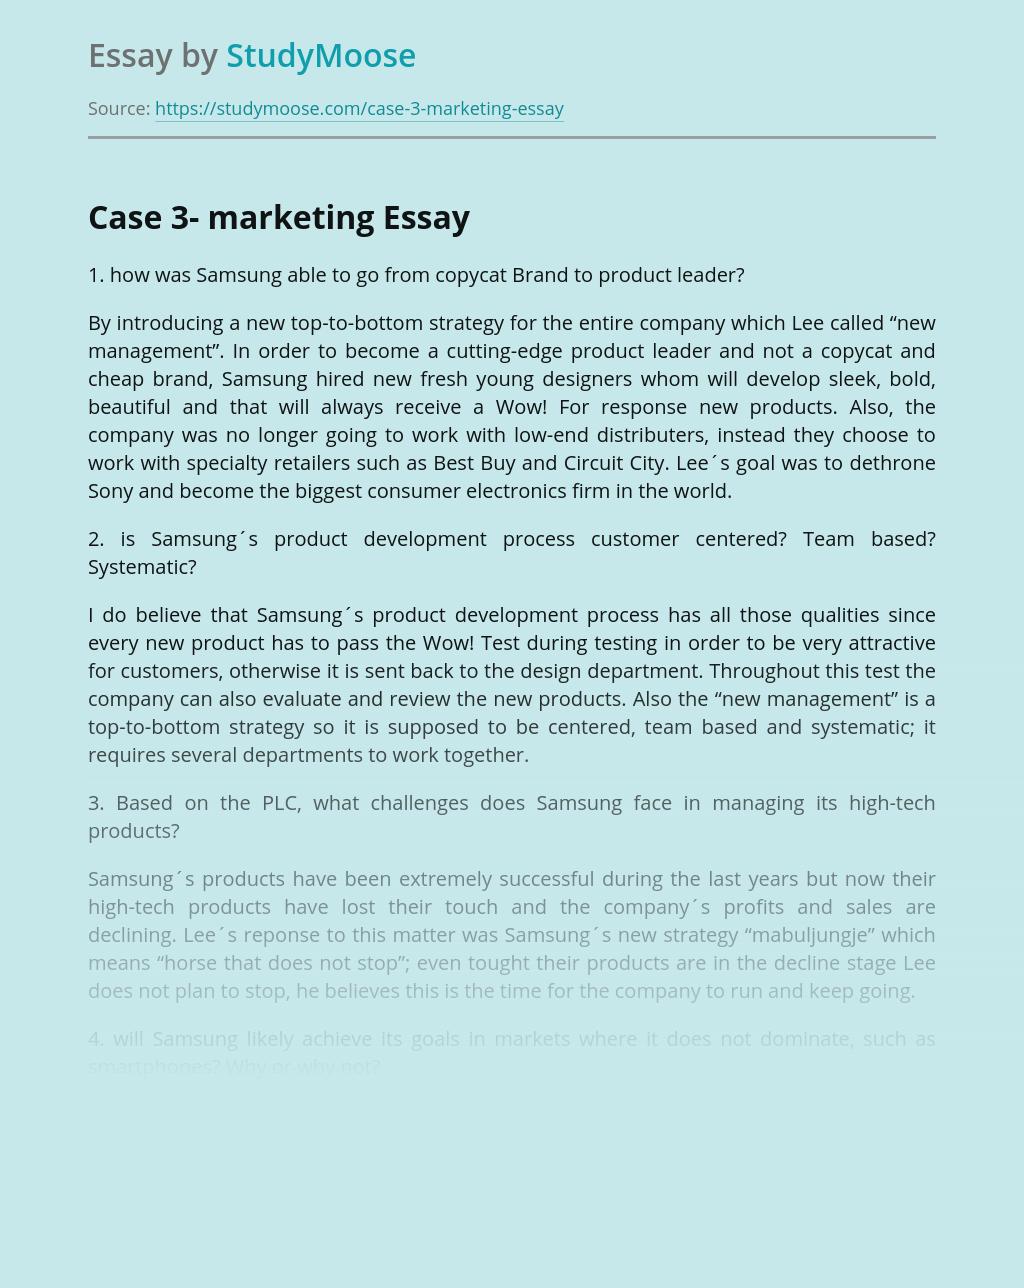 Case 3- marketing